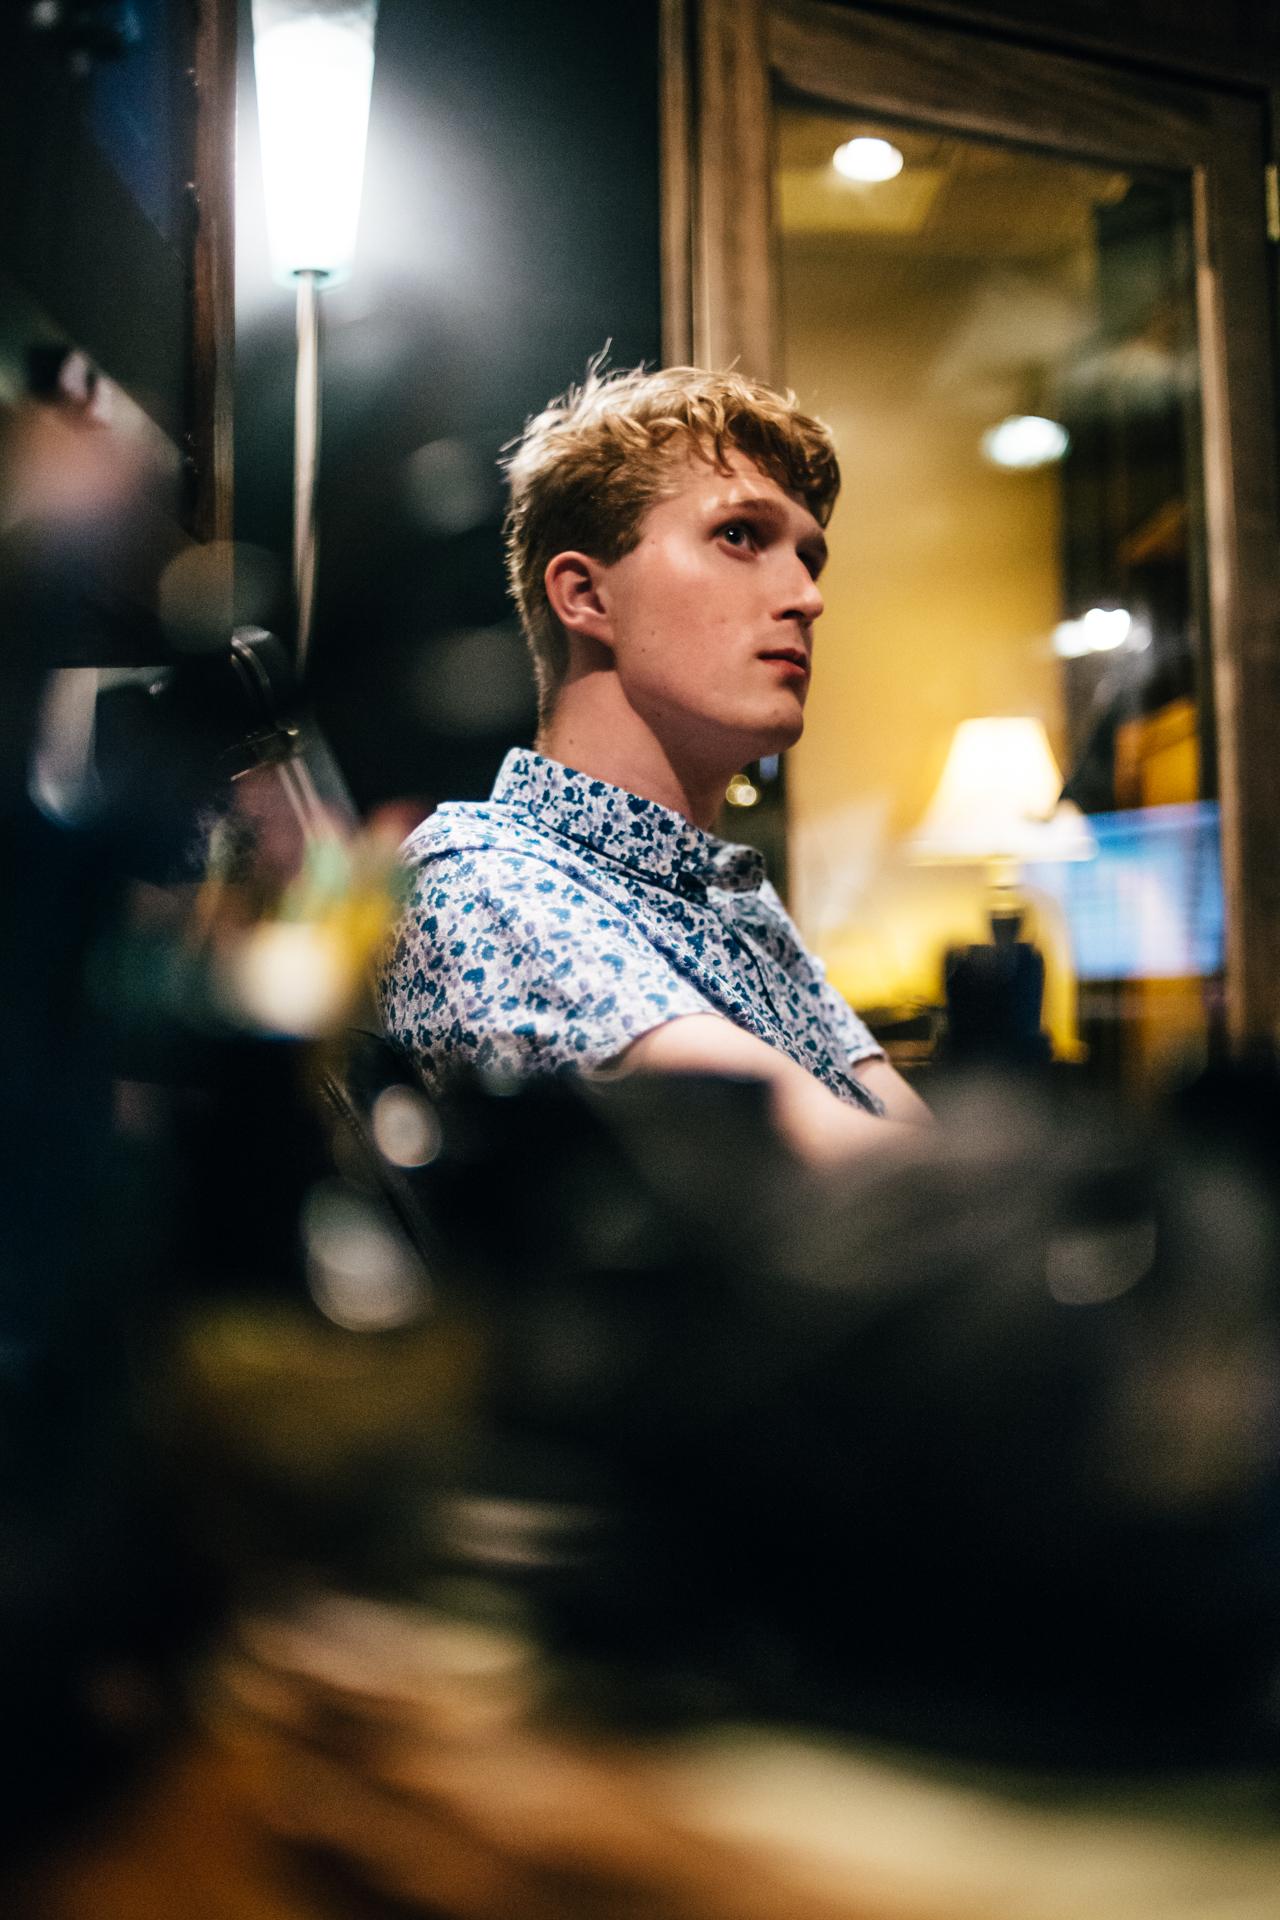 cool blurry shot in studio captured by Tim Duggan. Nashville, TN. May 2016.